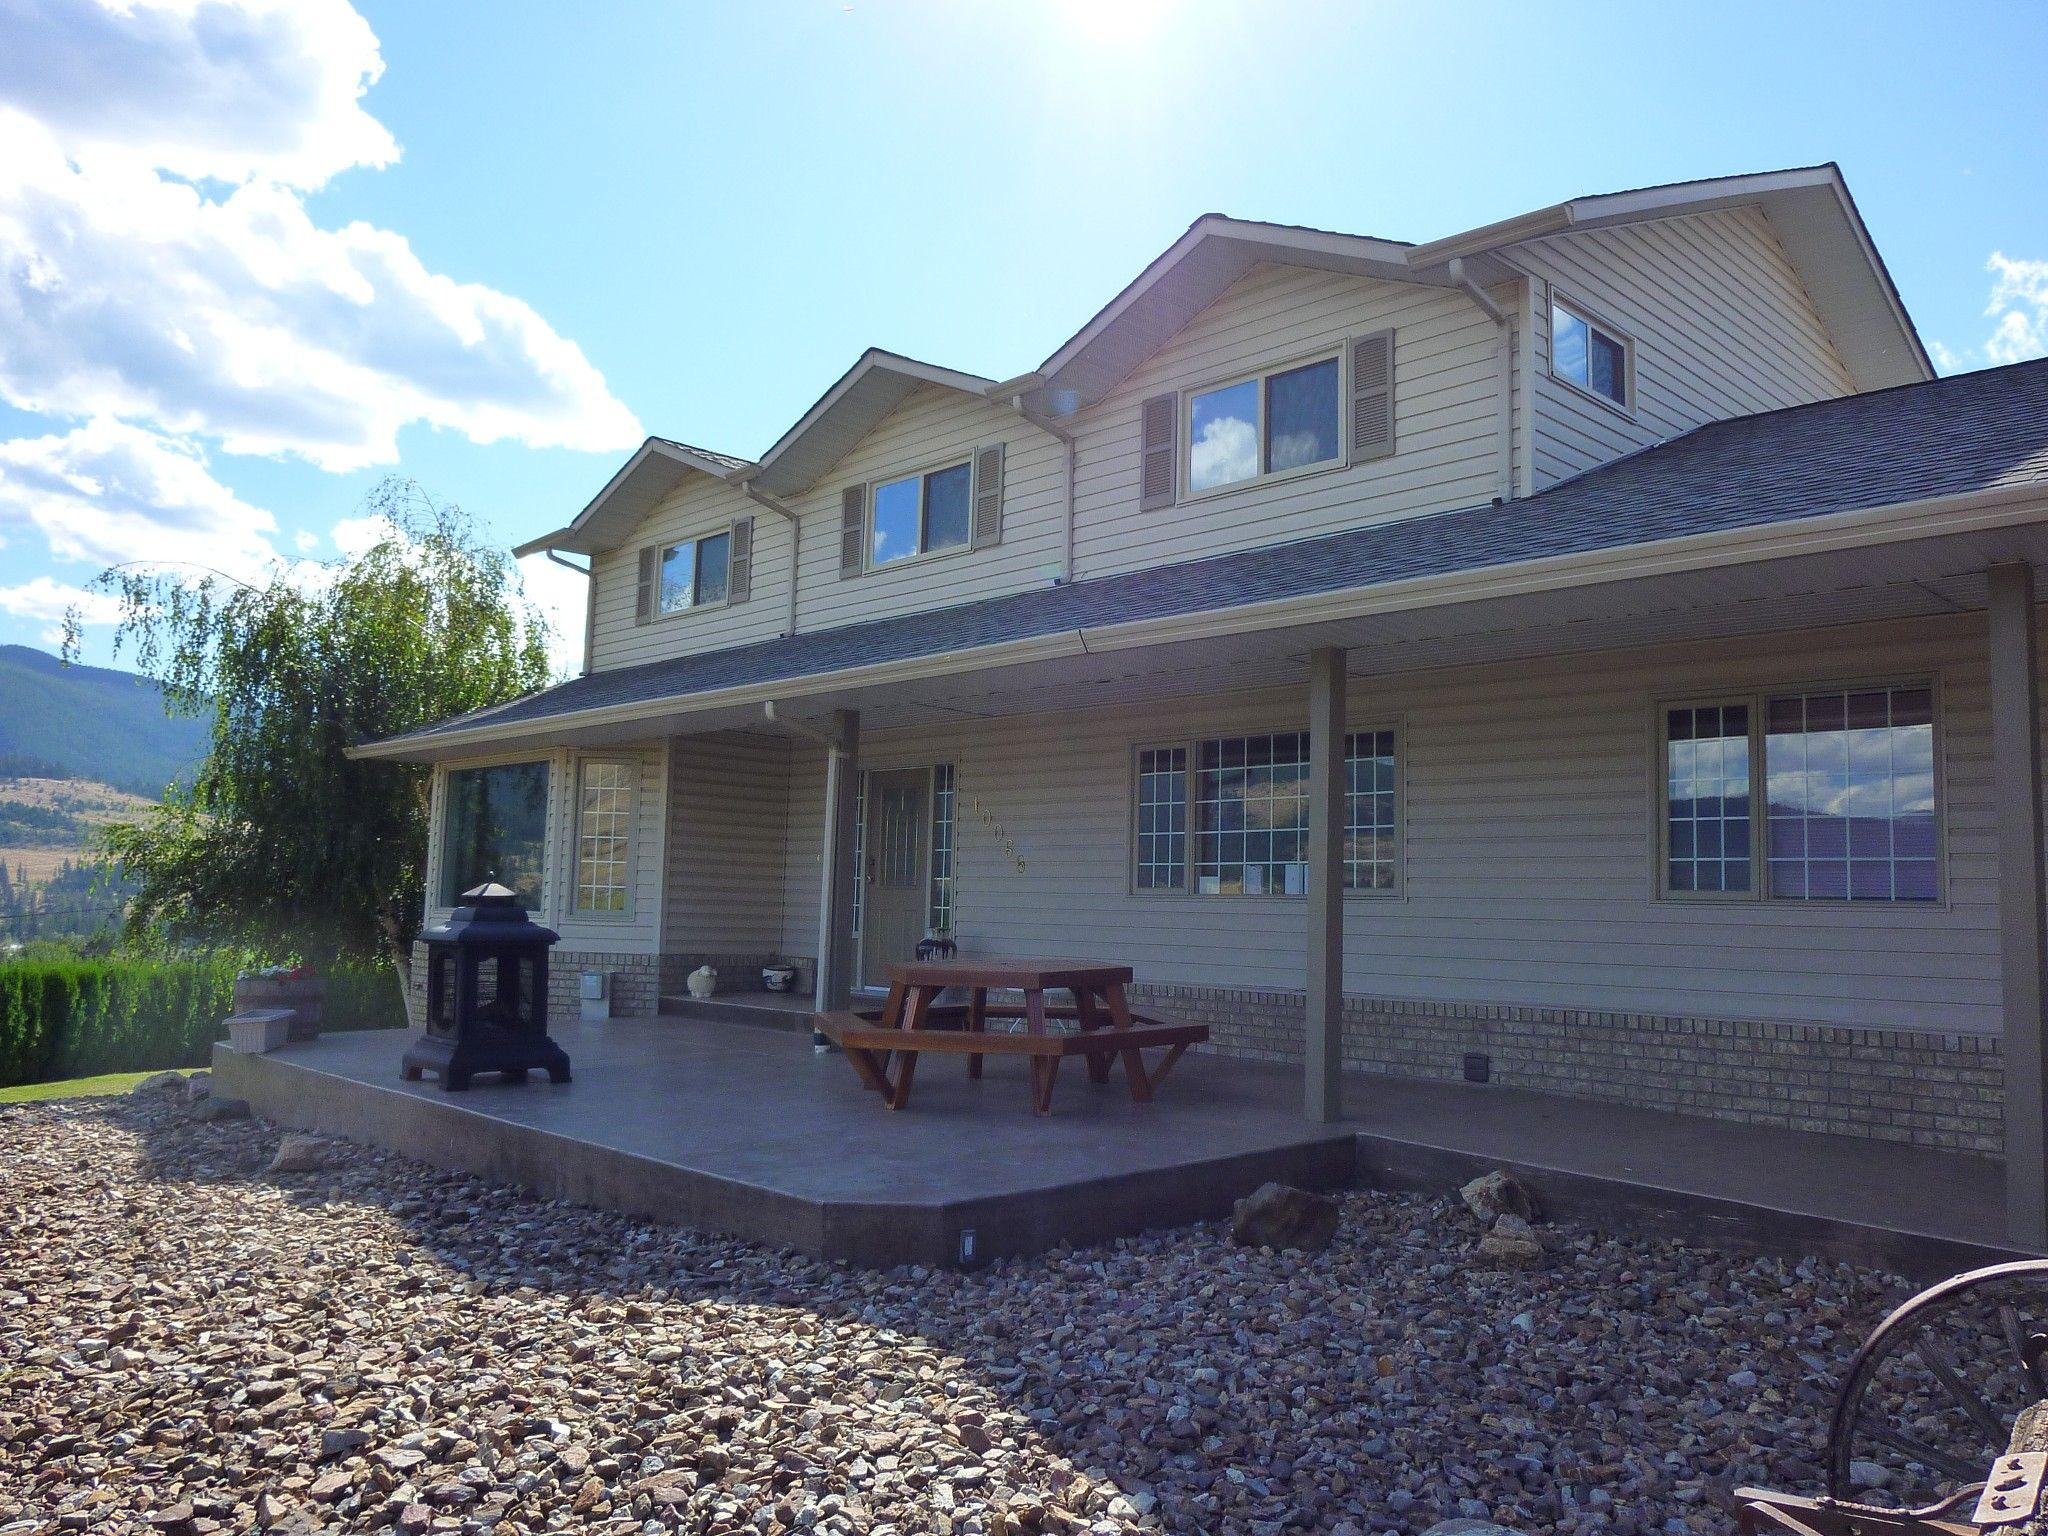 Main Photo: 10068 Grey Road in Coldstream: Mun of Coldstream House for sale (North Okanagan)  : MLS®# 10087849